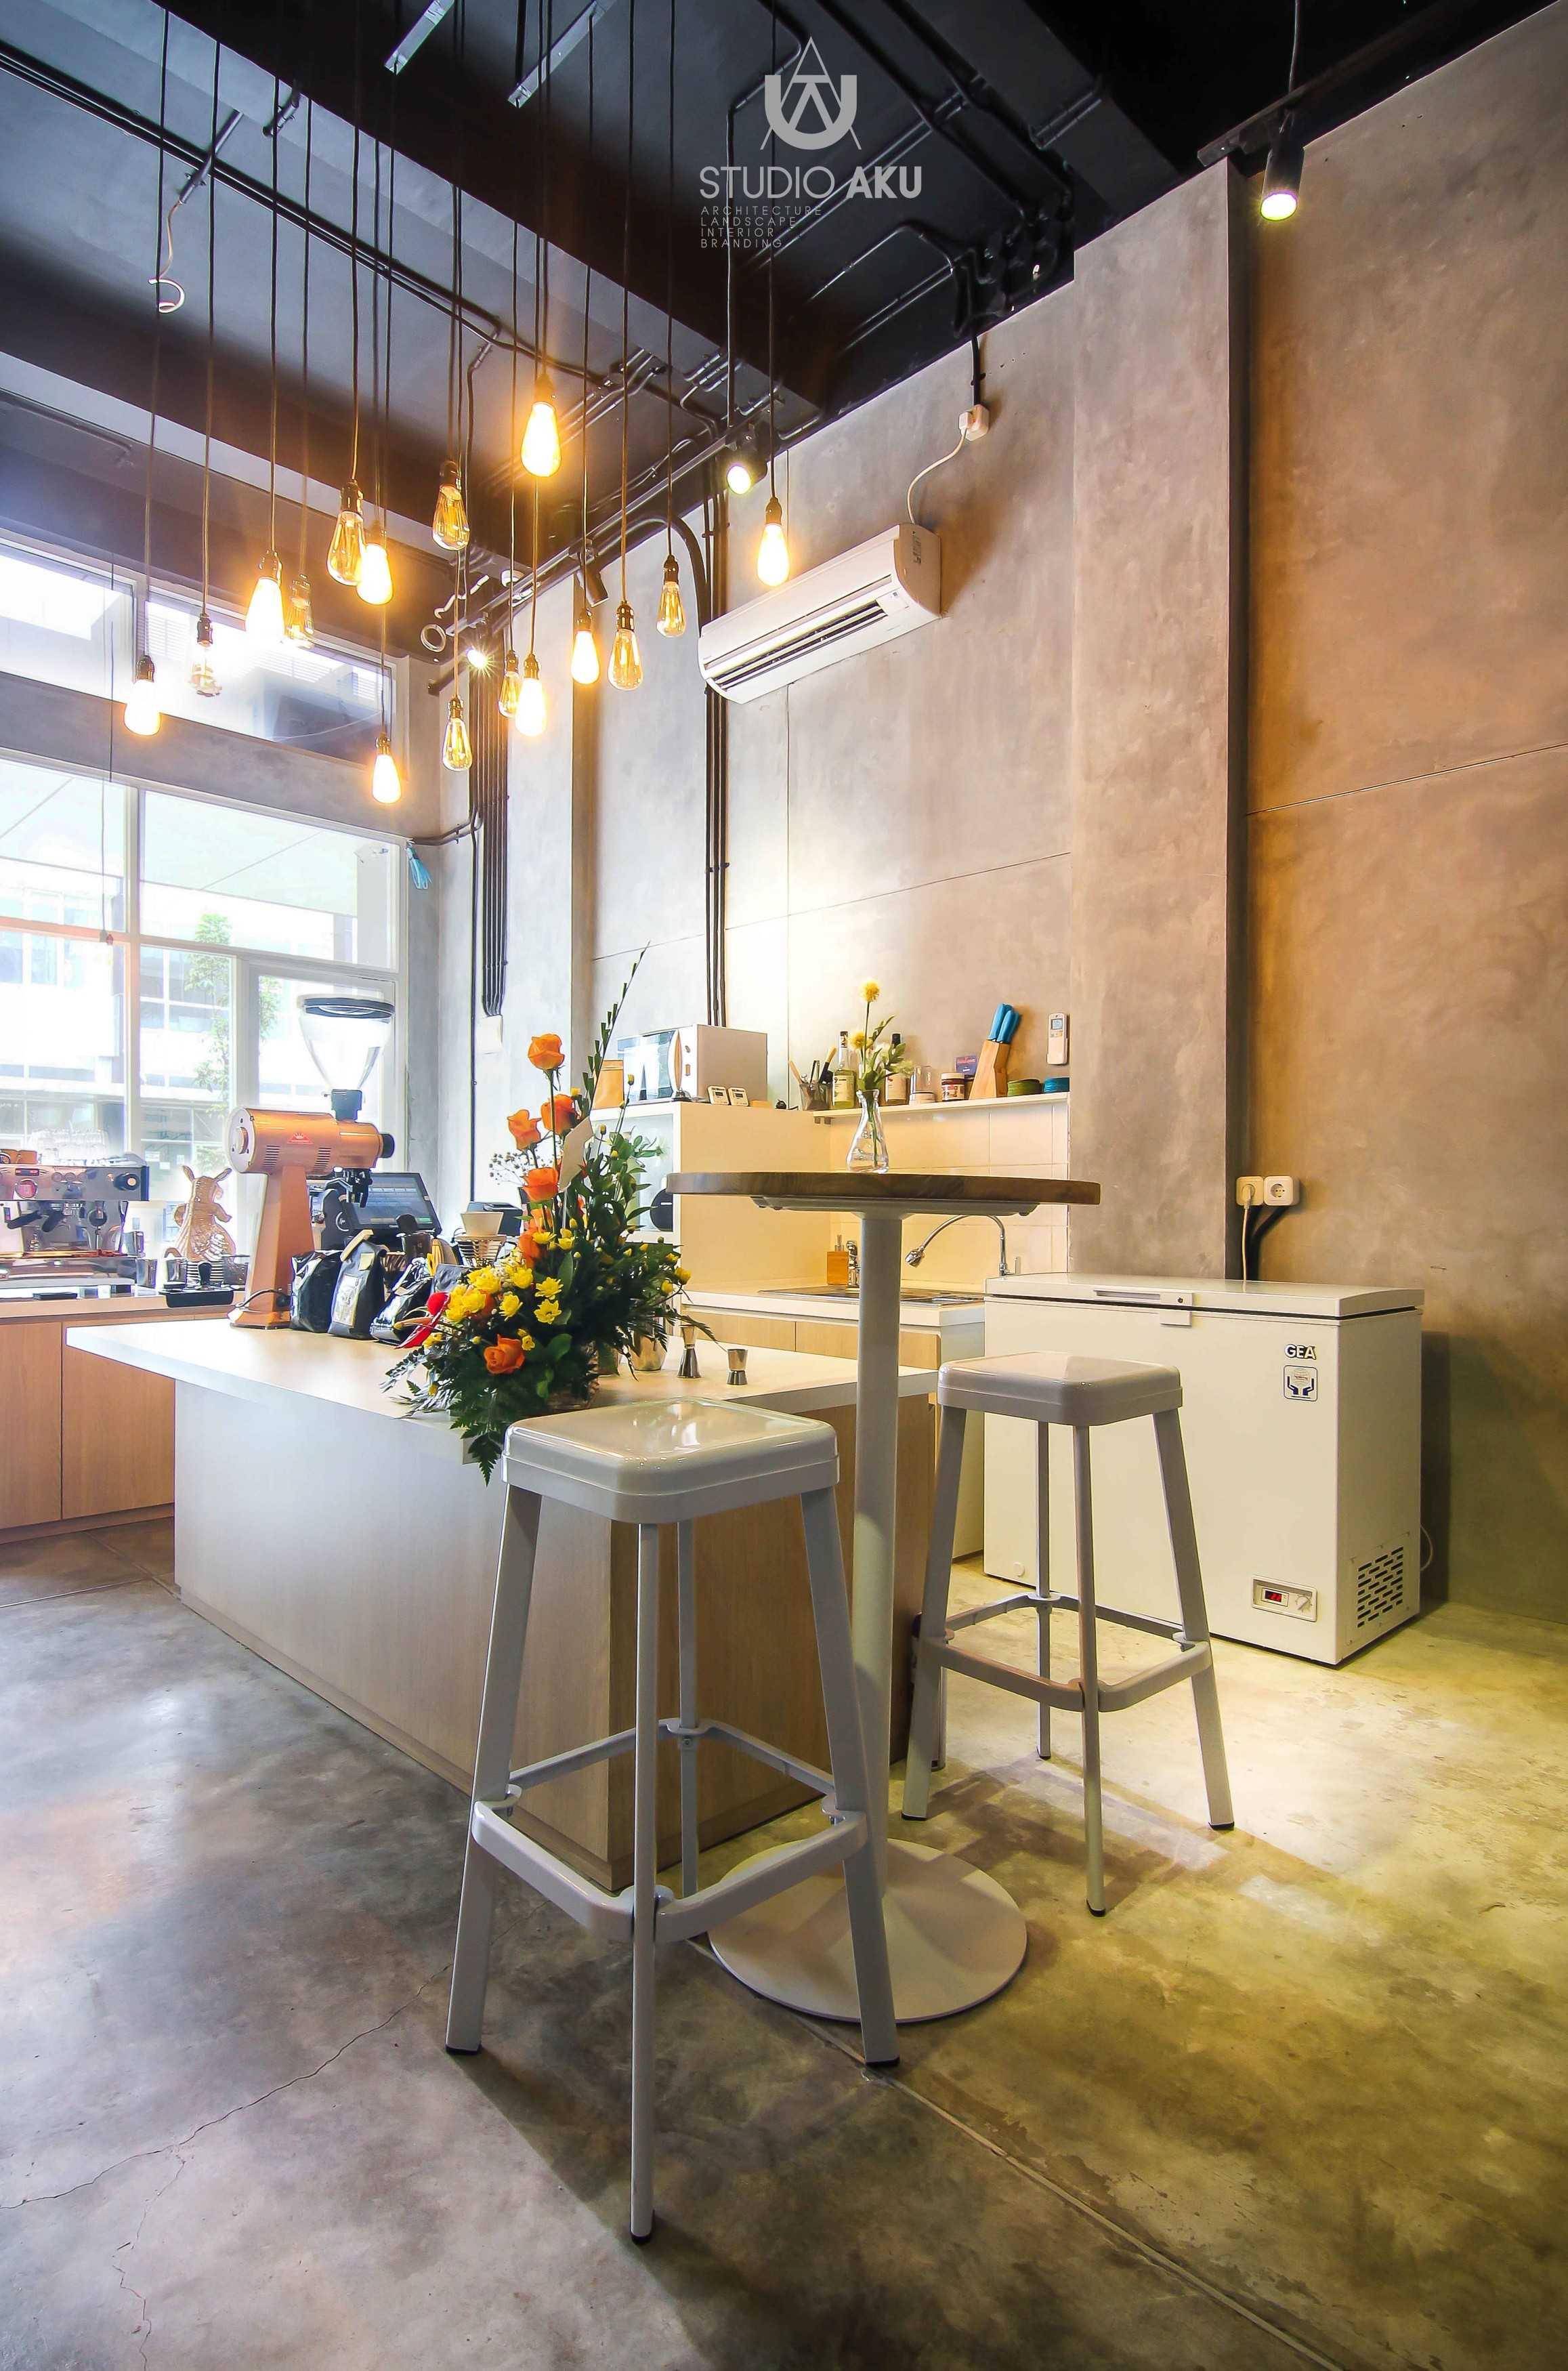 Studio Aku Spotten Alam Sutera, Ruko Prominence Alam Sutera, Ruko Prominence Restaurant Minimalis,modern,kontemporer,skandinavia  9322